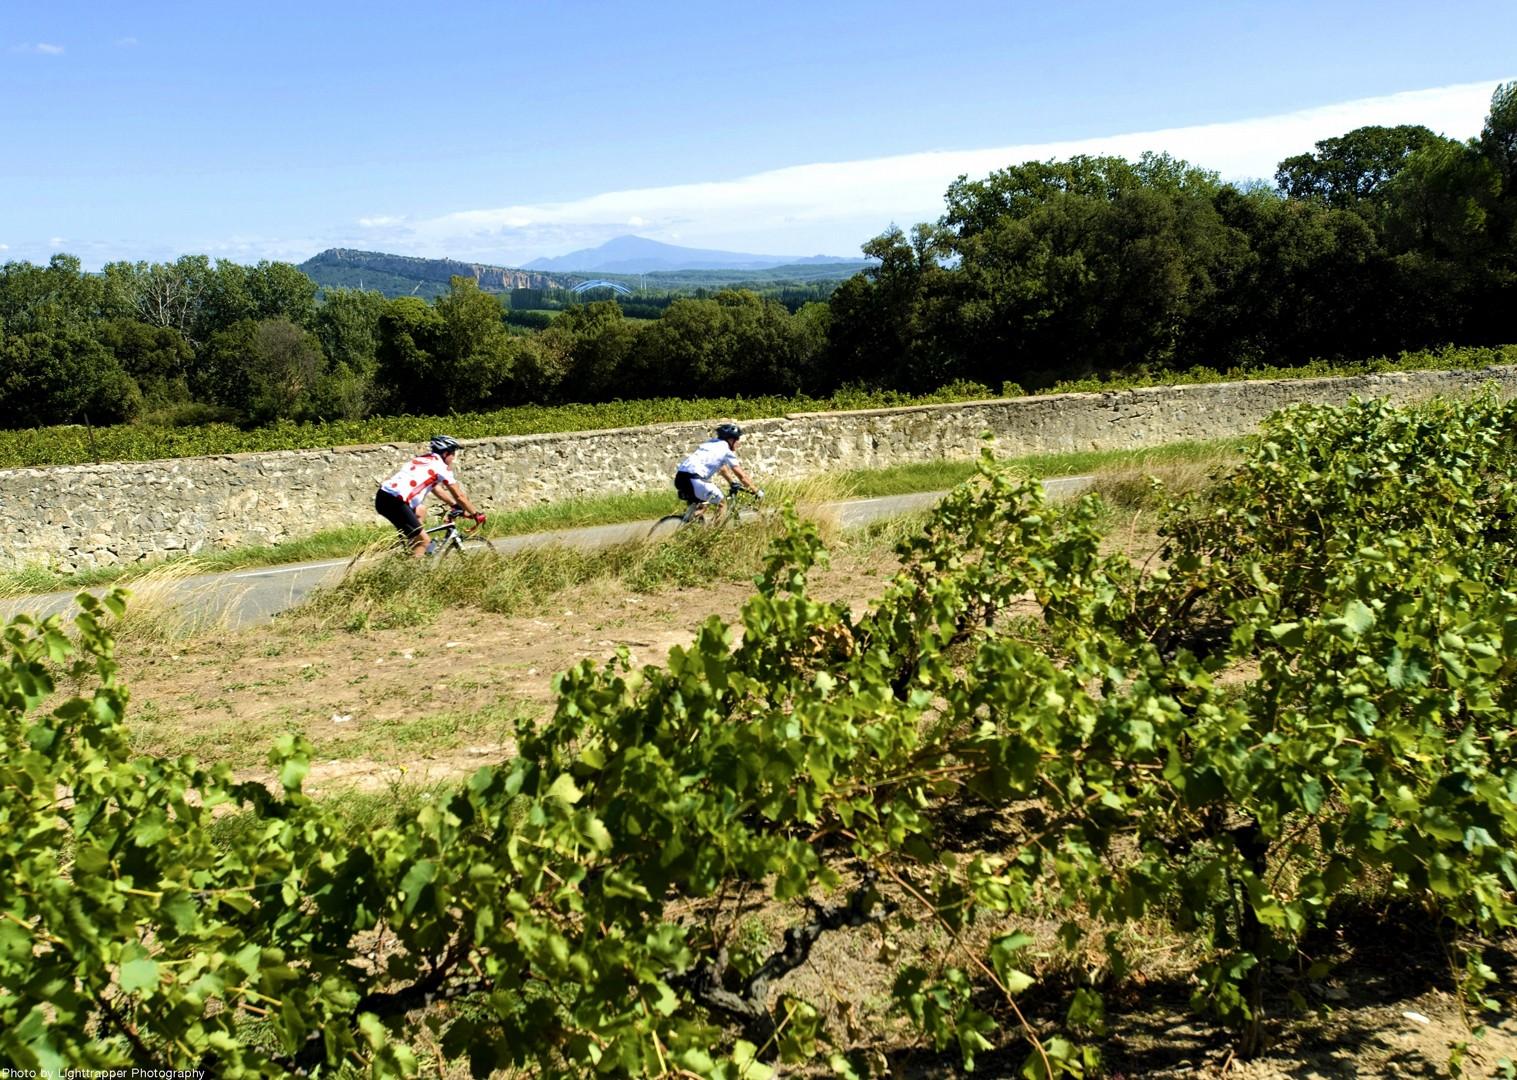 guided-road-biking-alsace-burgandy-beaujolais-france.jpg - NEW! France - Alsace, Burgundy and Beaujolais - Road Cycling